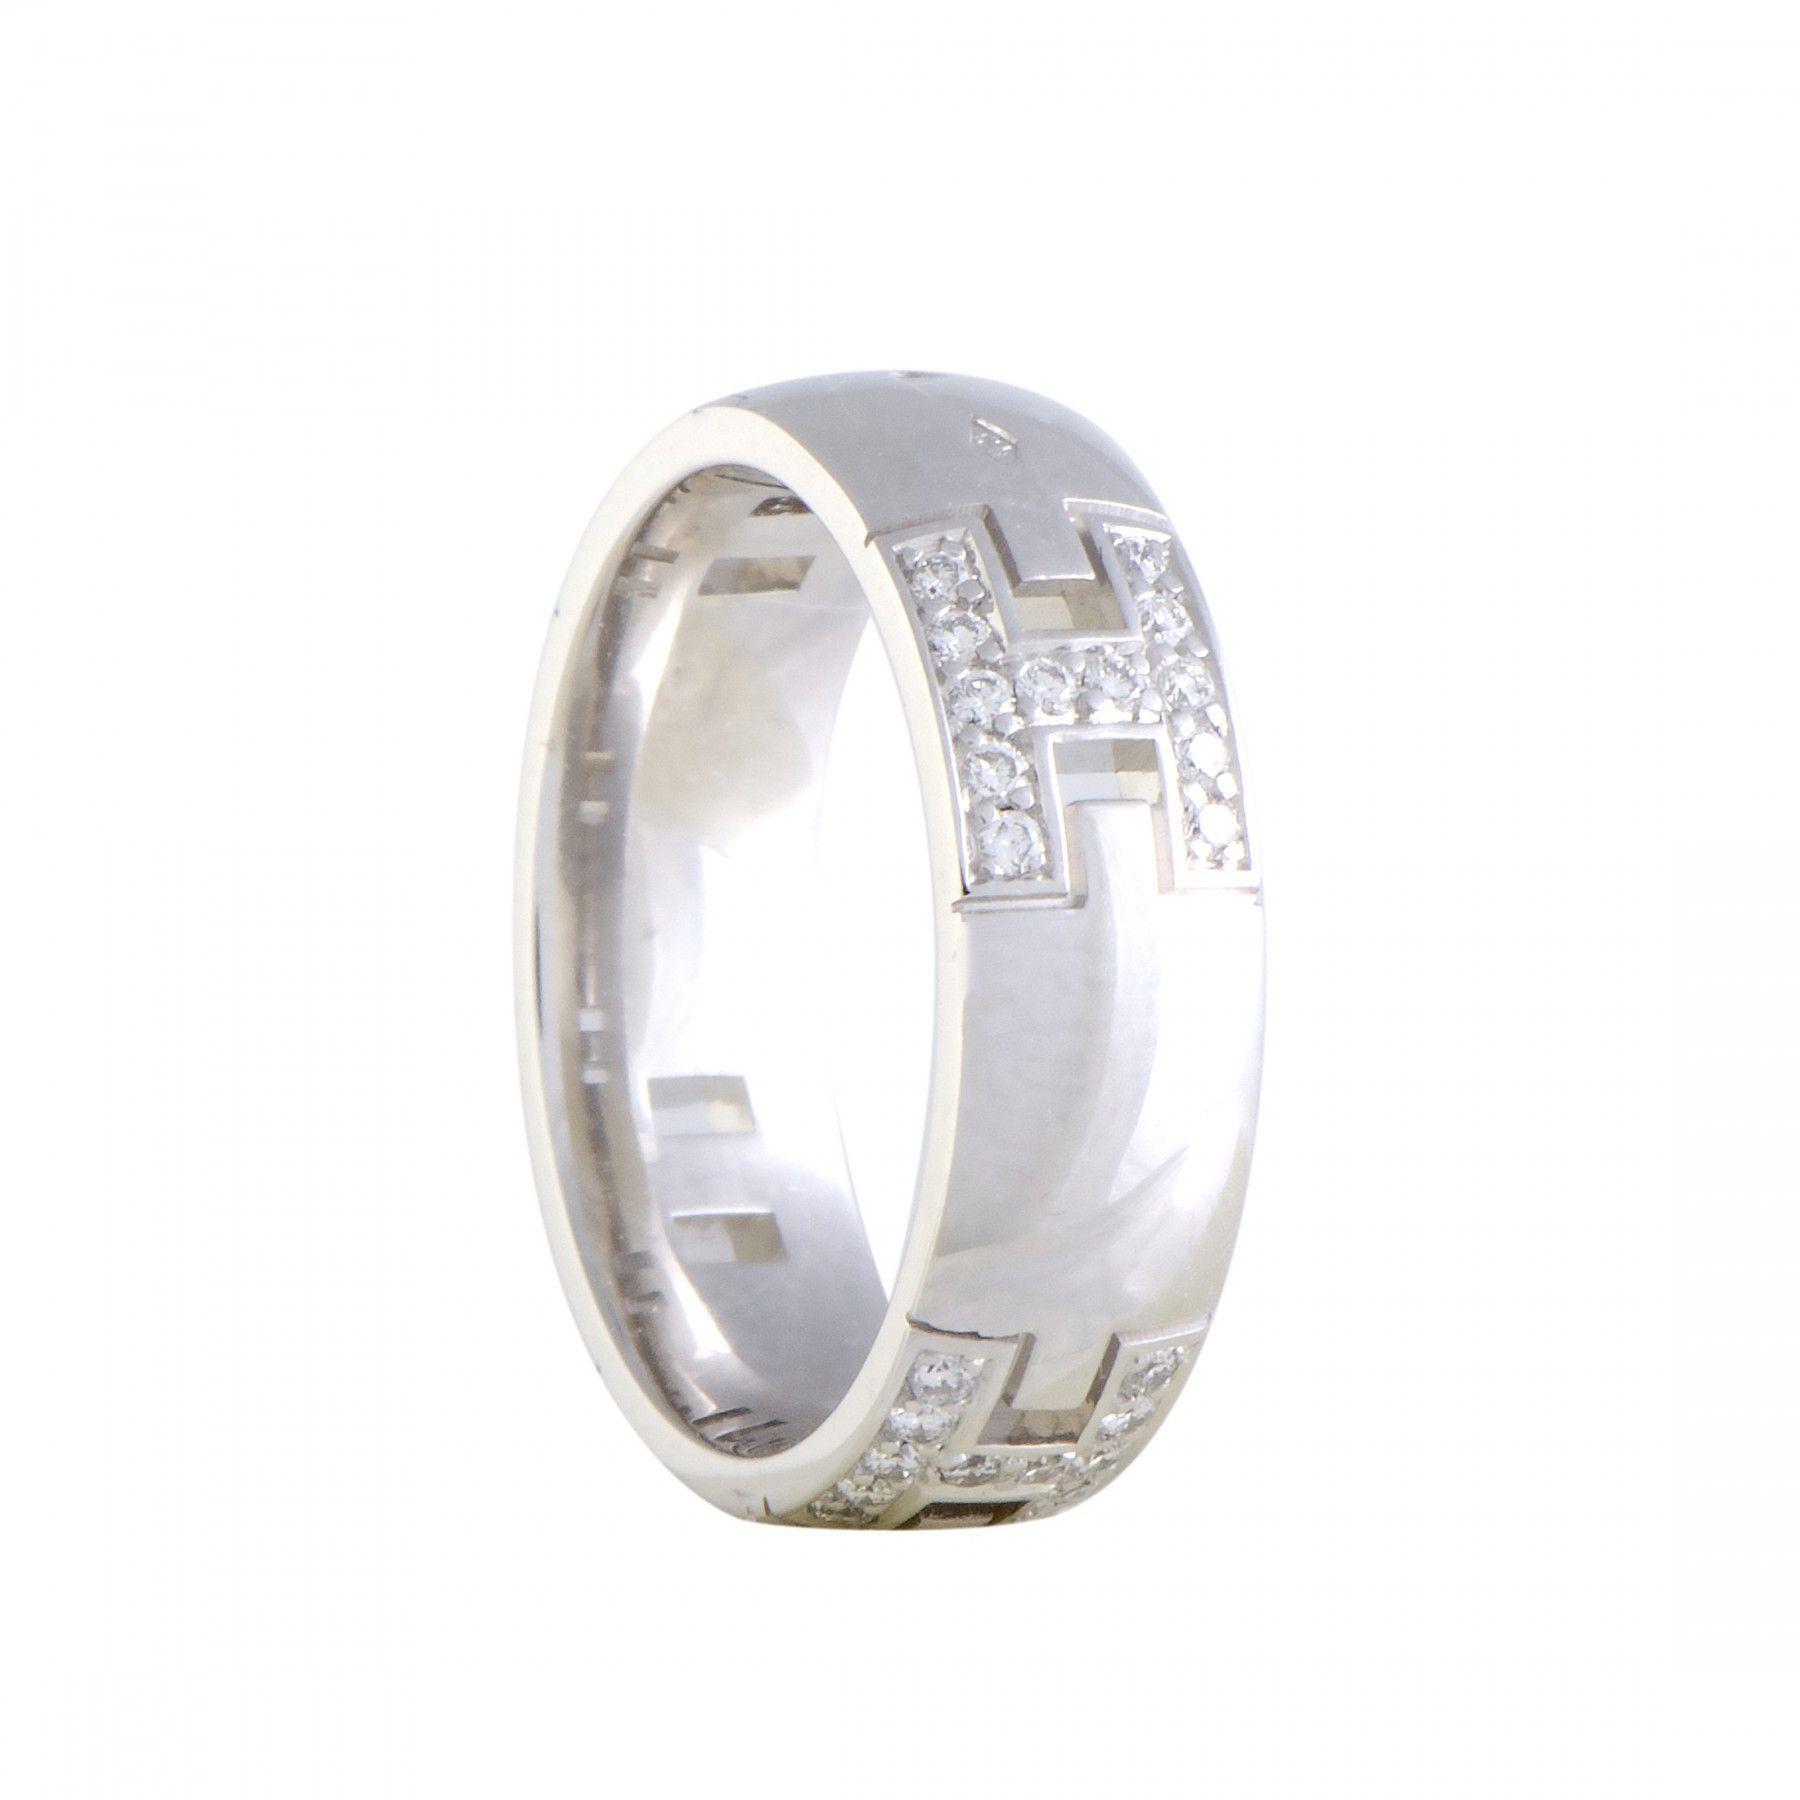 91f68fe8a778 ... greece hermès 18k white gold diamond pave hercules band ring 1b967 15996